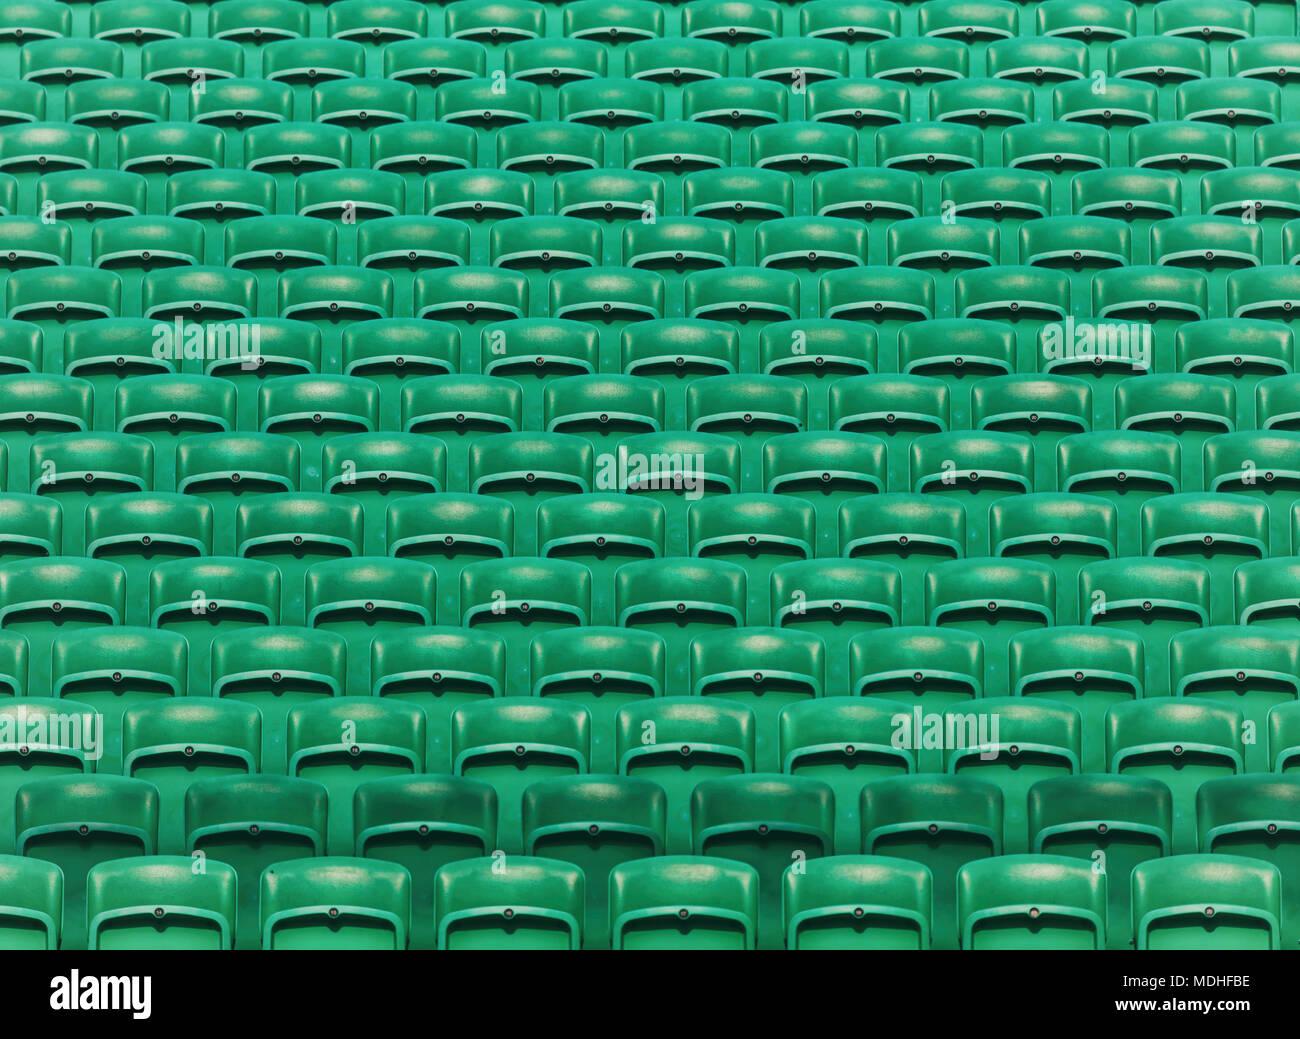 Rows Of Green Empty Folding Stadium Seats Background Stock